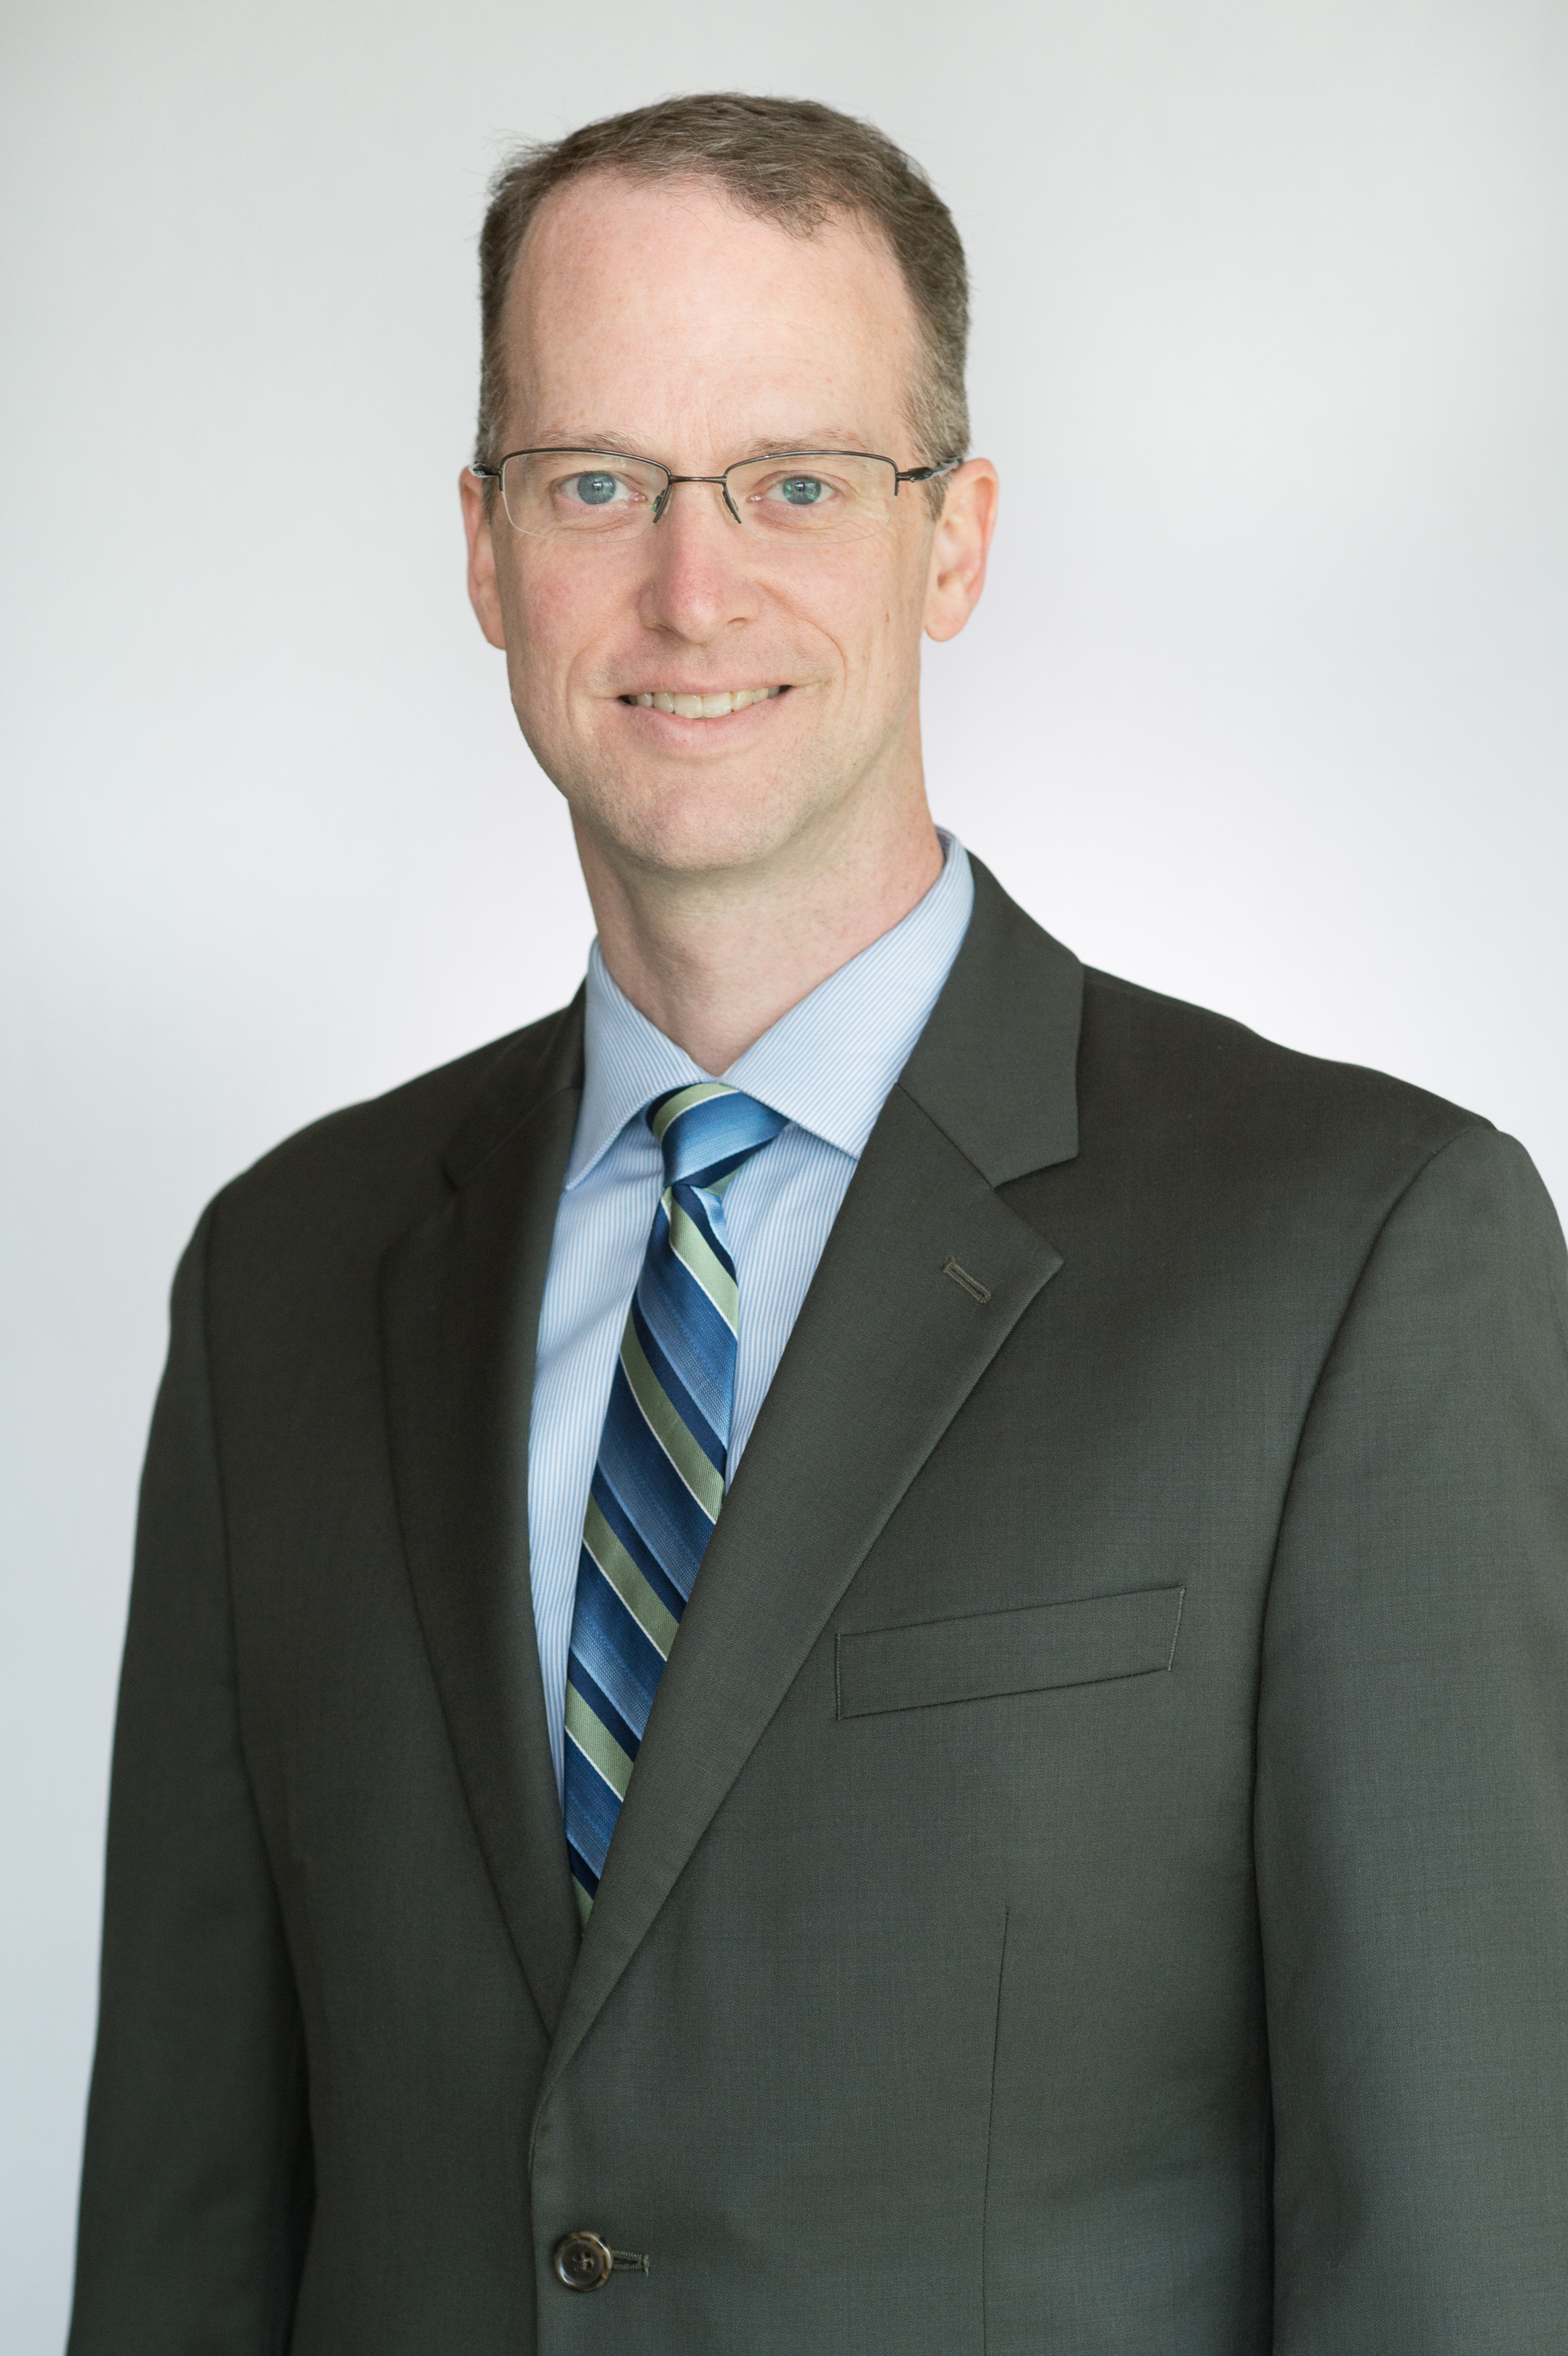 Kevin Hebblethwaite